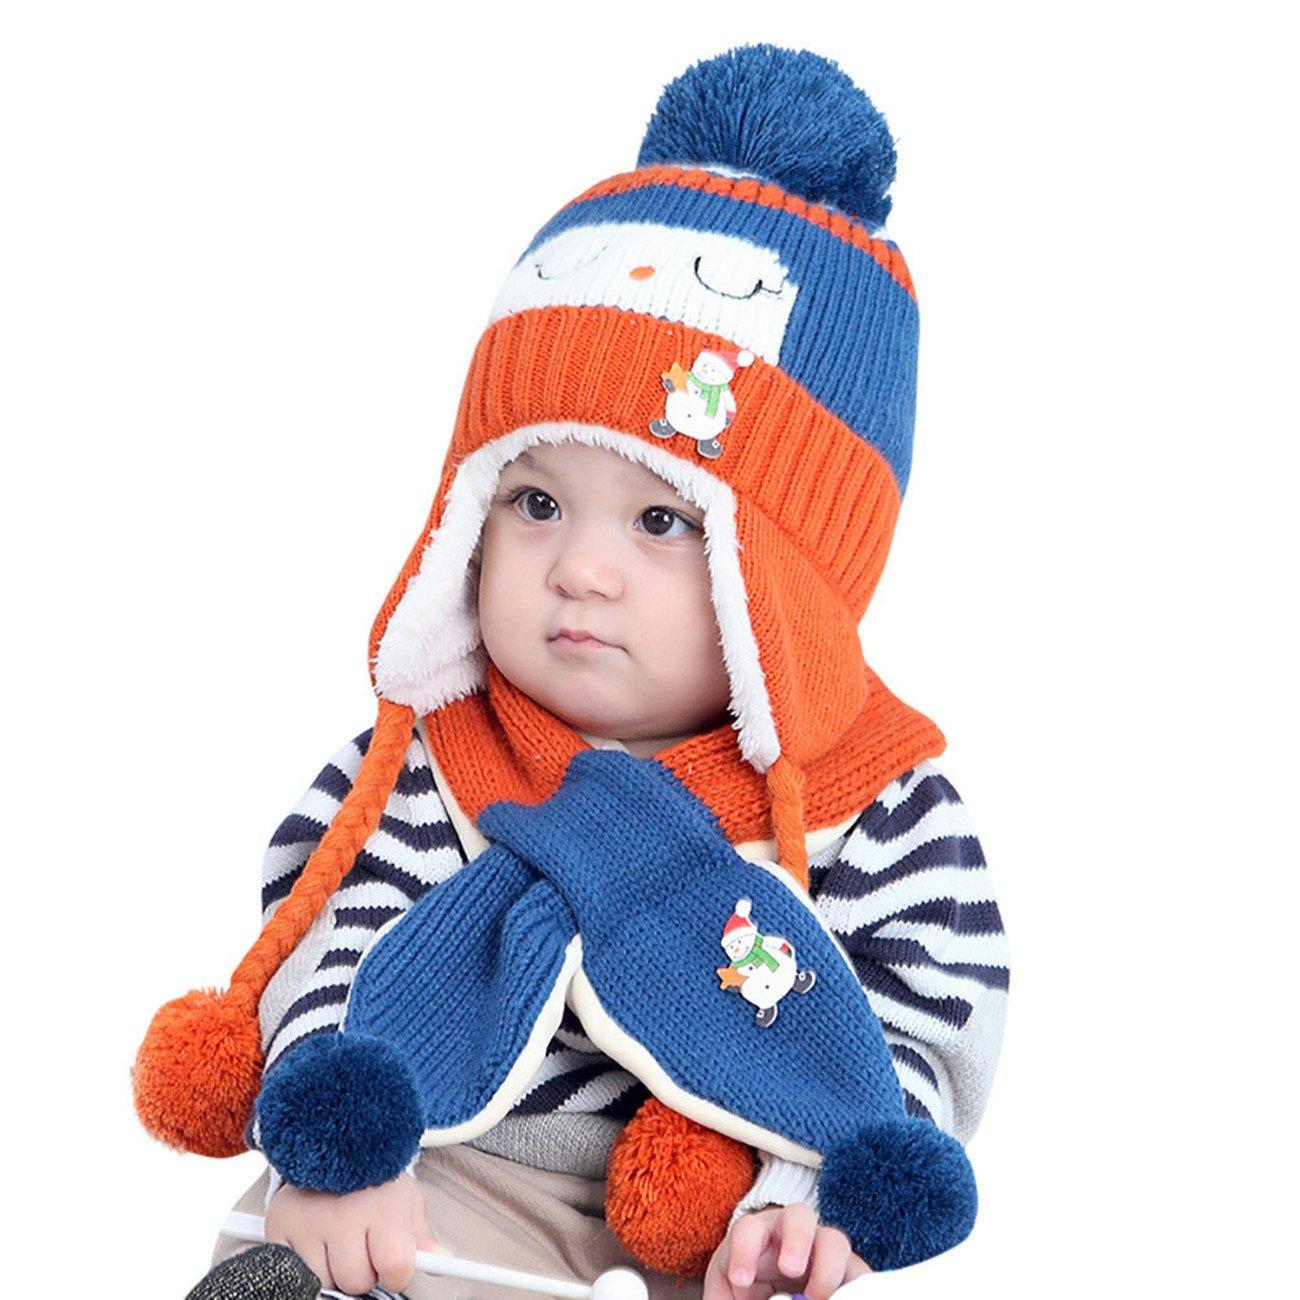 021837c1c0649 Amazon.com  TAORE Baby Girls Boys Hats Winter Warm Cap Hat Beanie Pilot  Aviator Crochet Earflap Skull Caps (1-3 Years